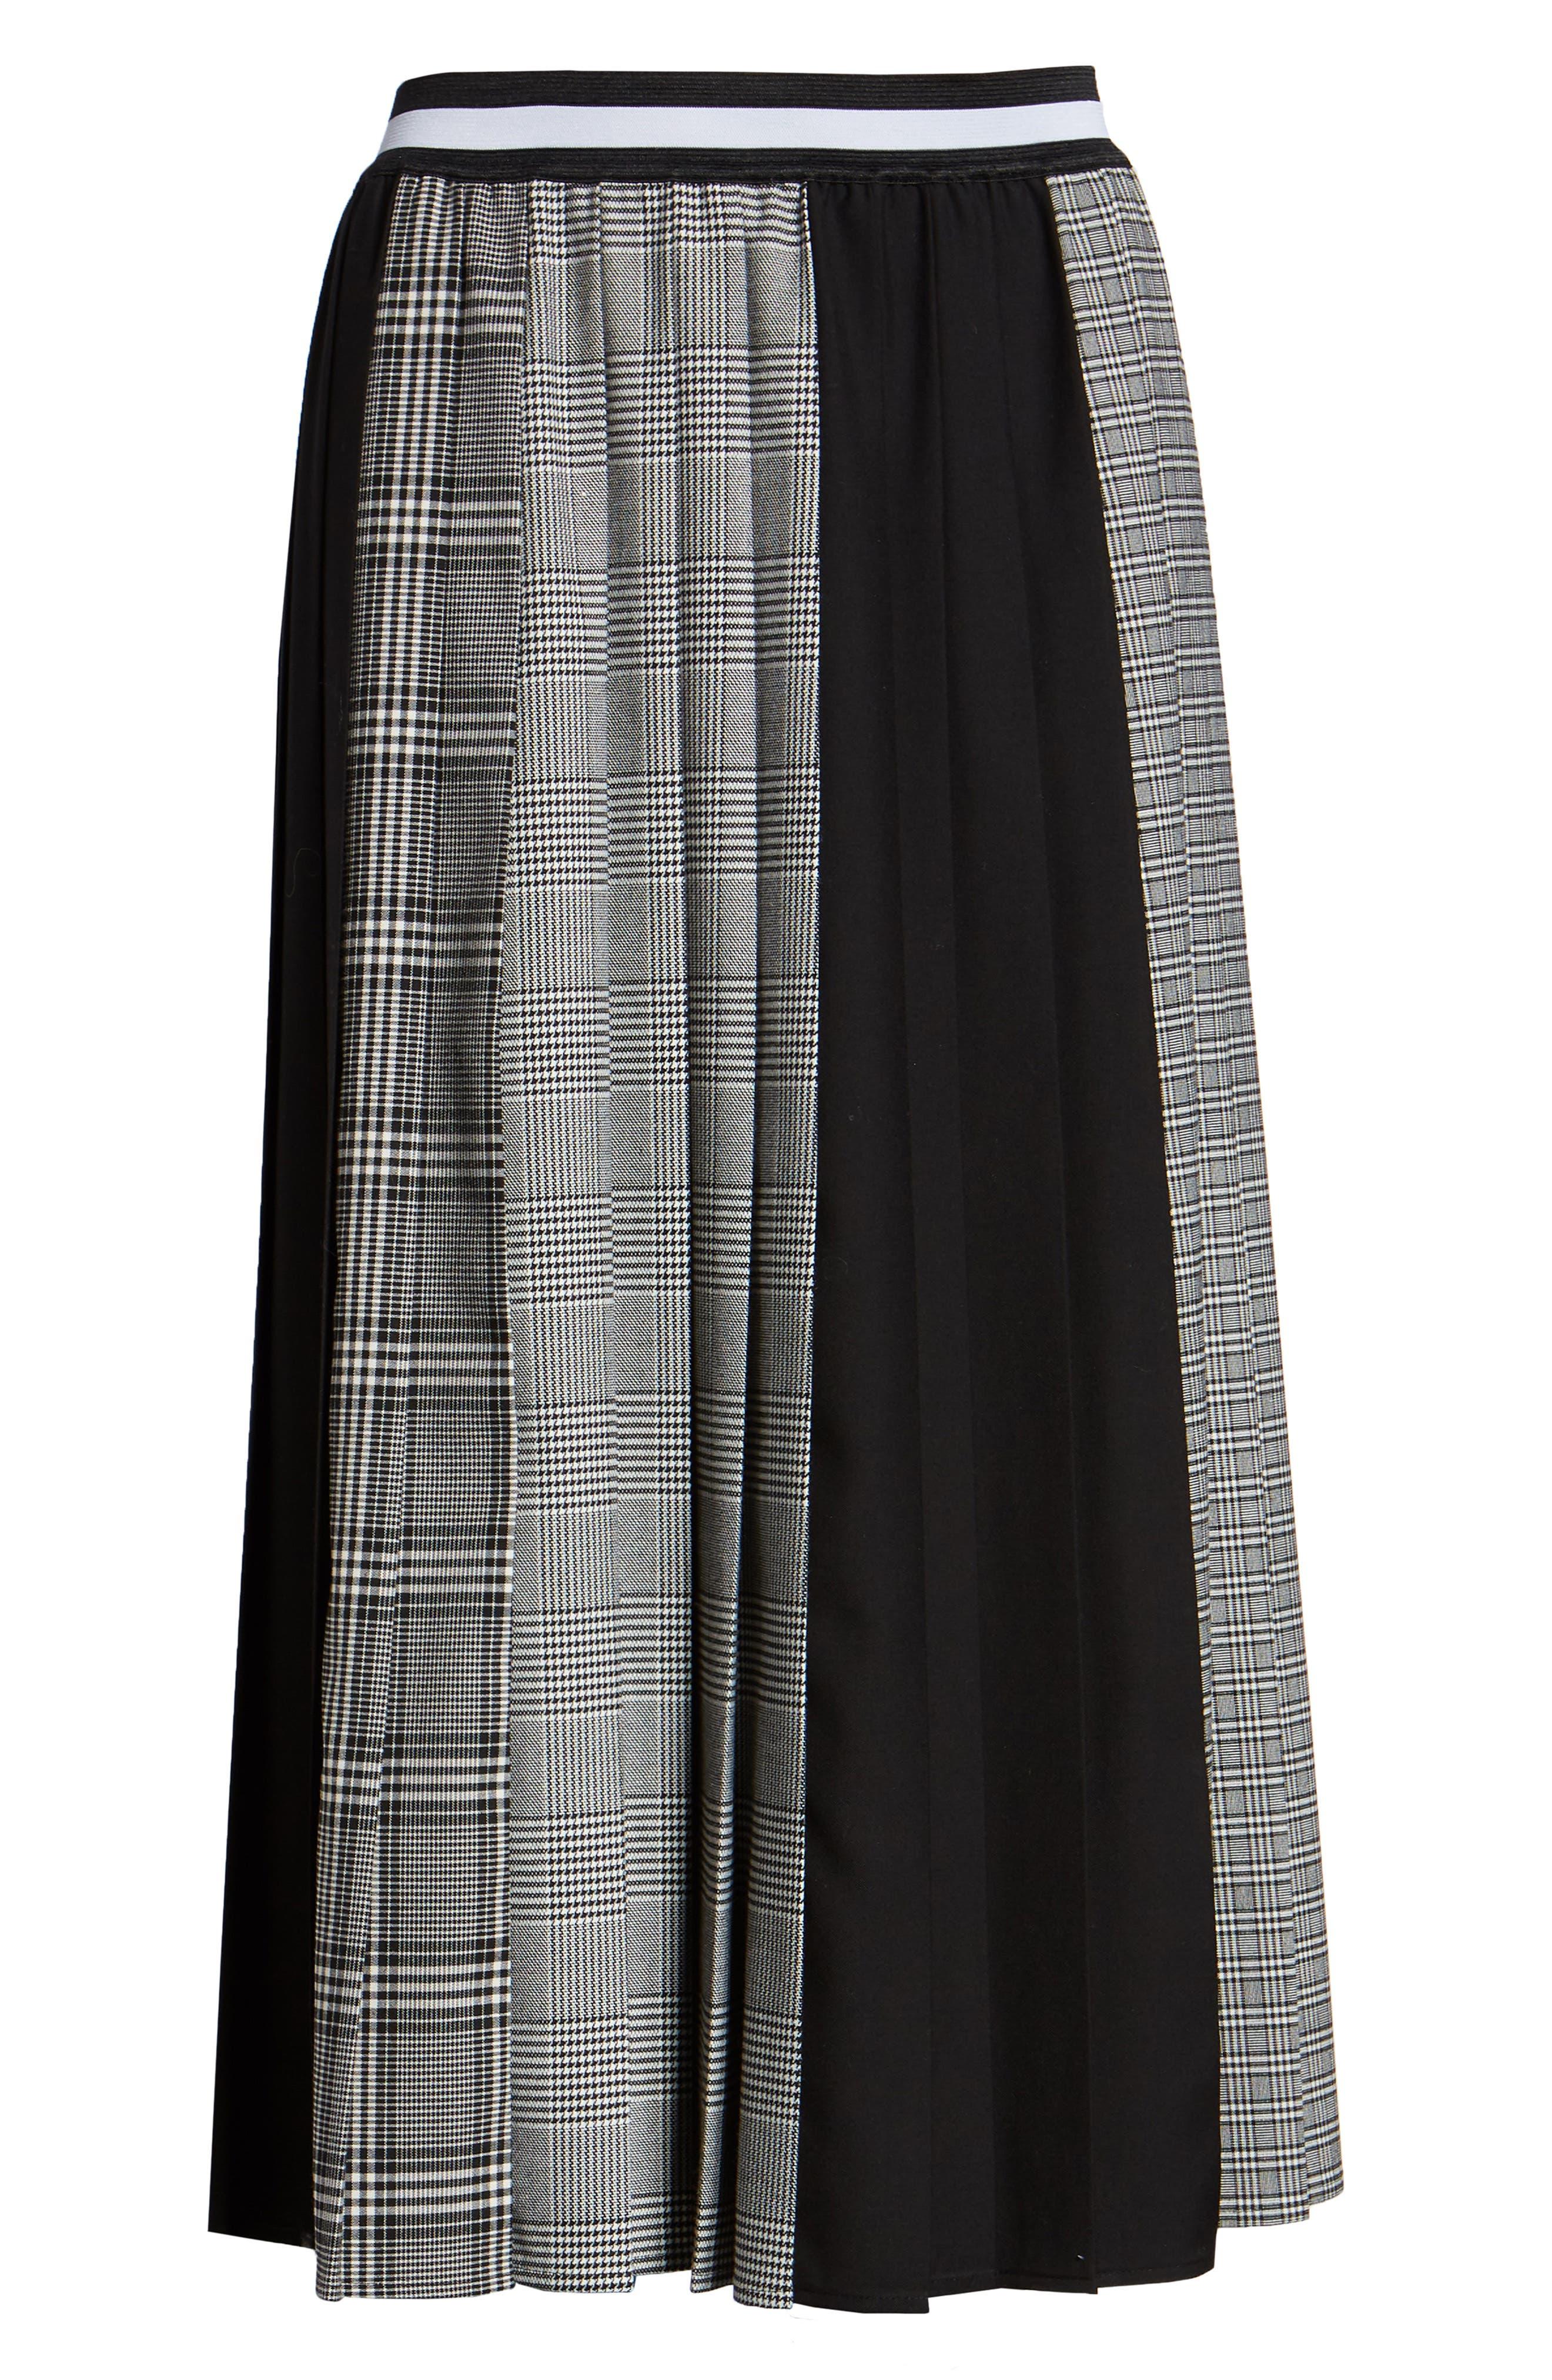 Plaid A-Line Skirt,                             Alternate thumbnail 6, color,                             001